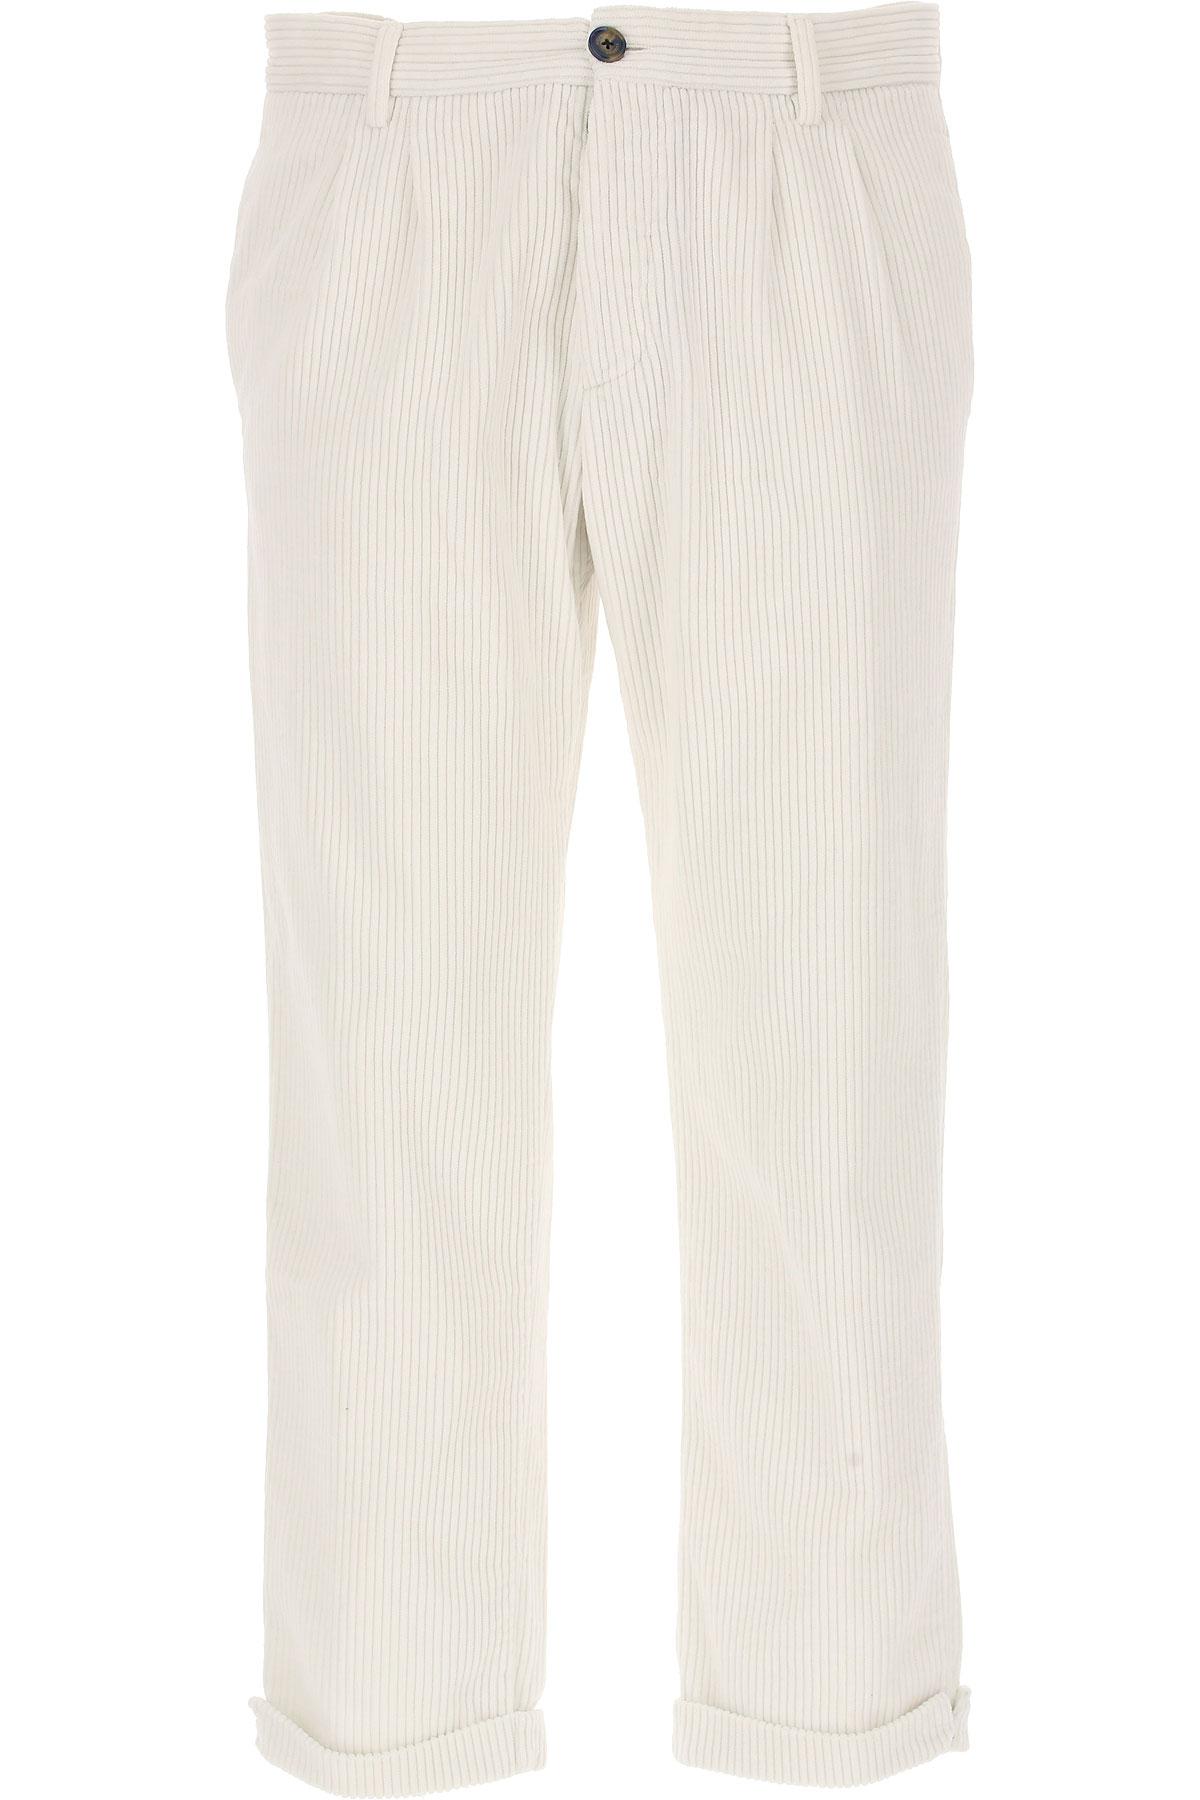 Image of J.W. Brine Pants for Men, Natural, Cotton, 2017, 30 32 34 38